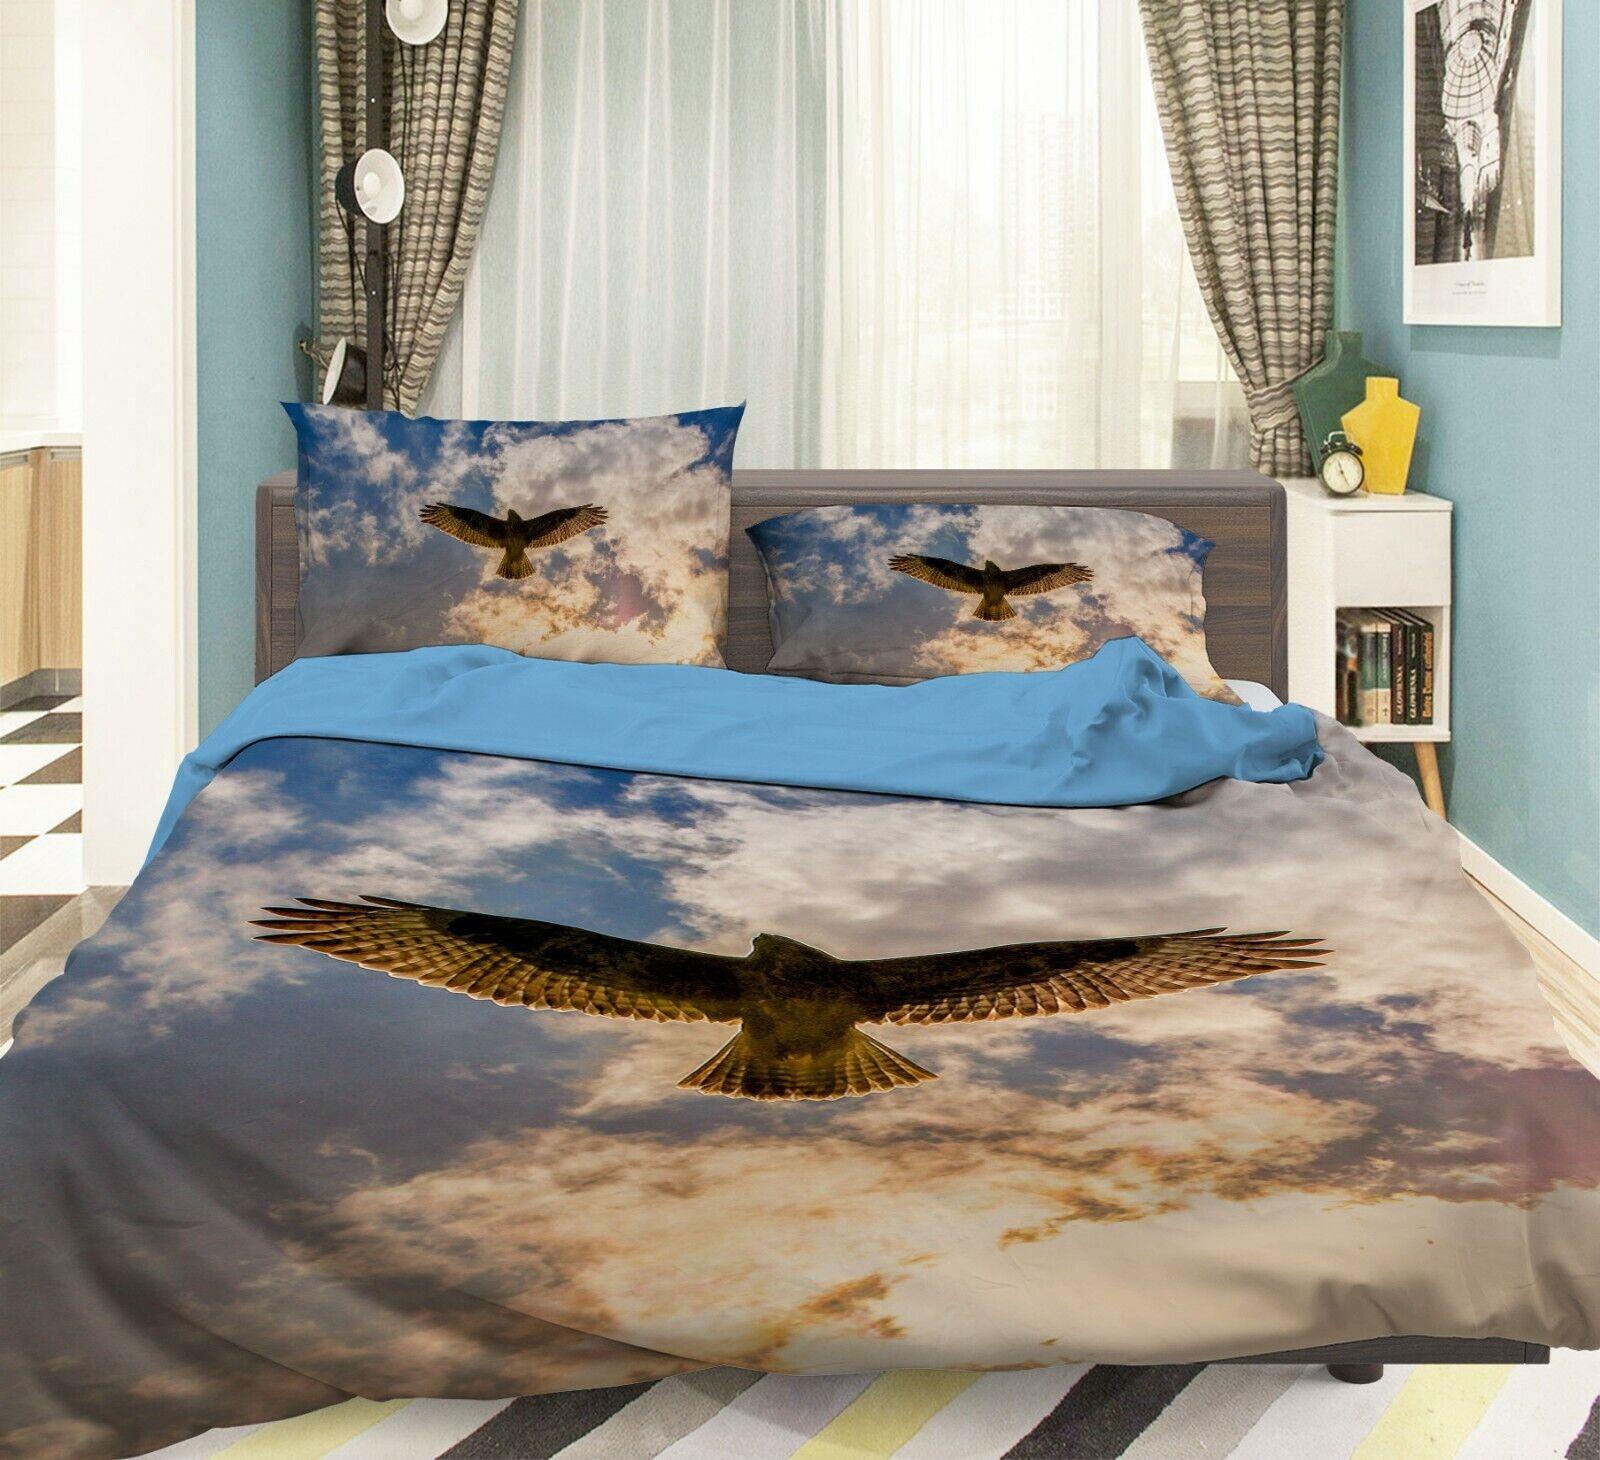 3D Buzzard I06 Animal Bed Pillowcases Quilt Duvet Cover Queen King Angelia